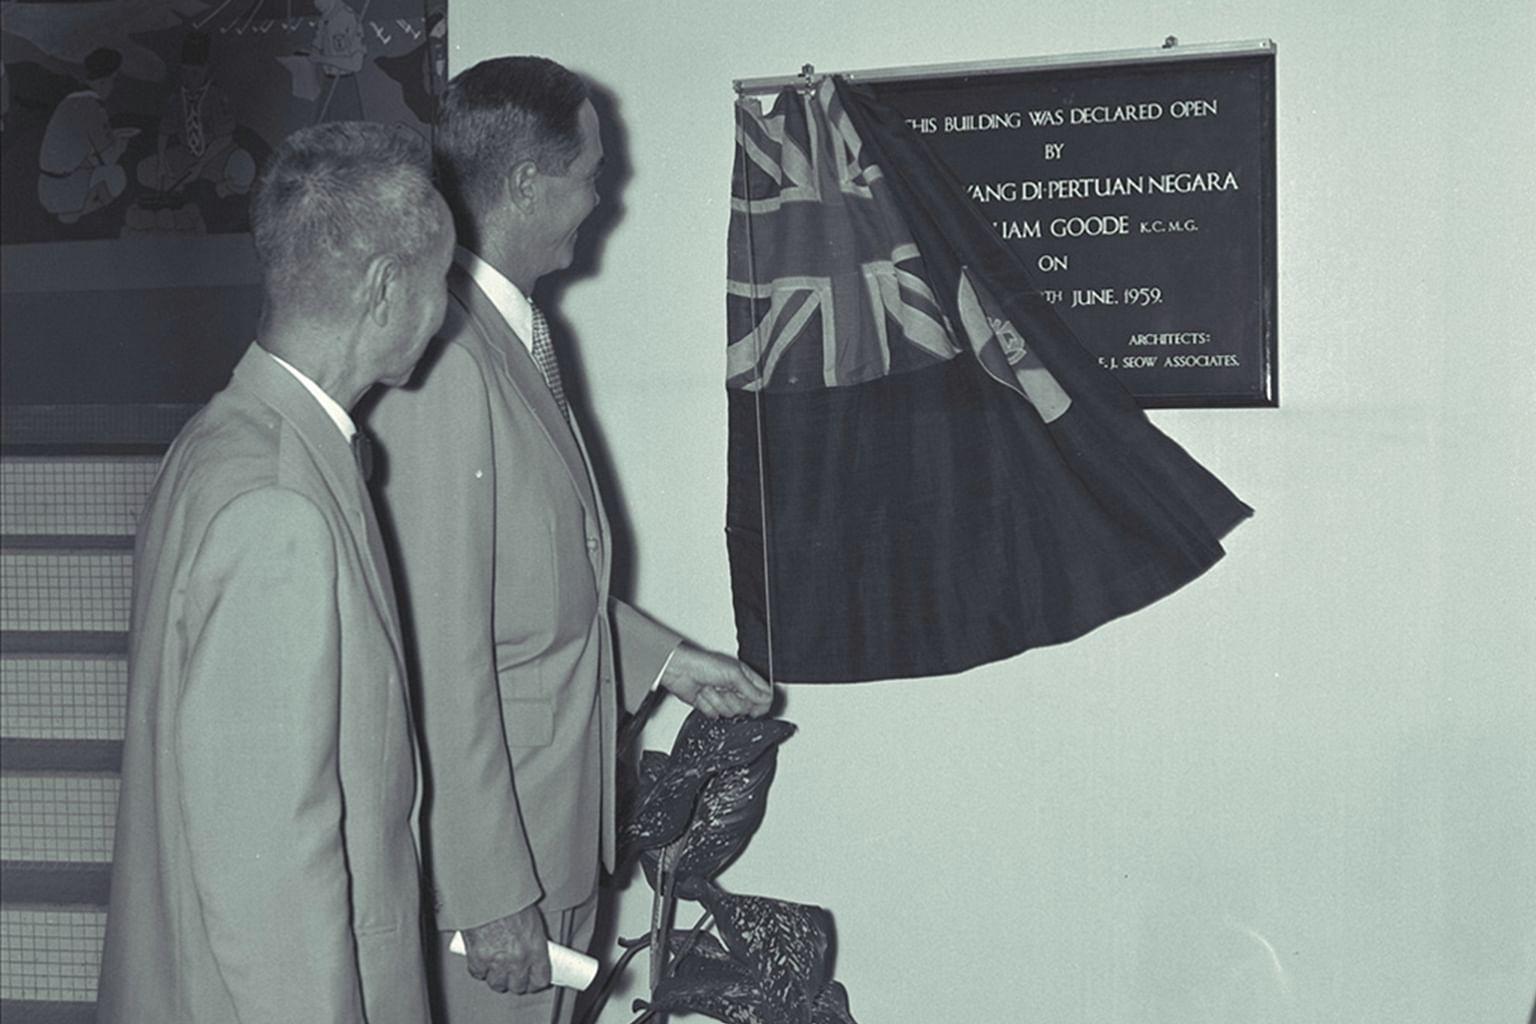 Then Yang di-Pertuan Negara and Chief Scout of Singapore Sir William Goode (right).